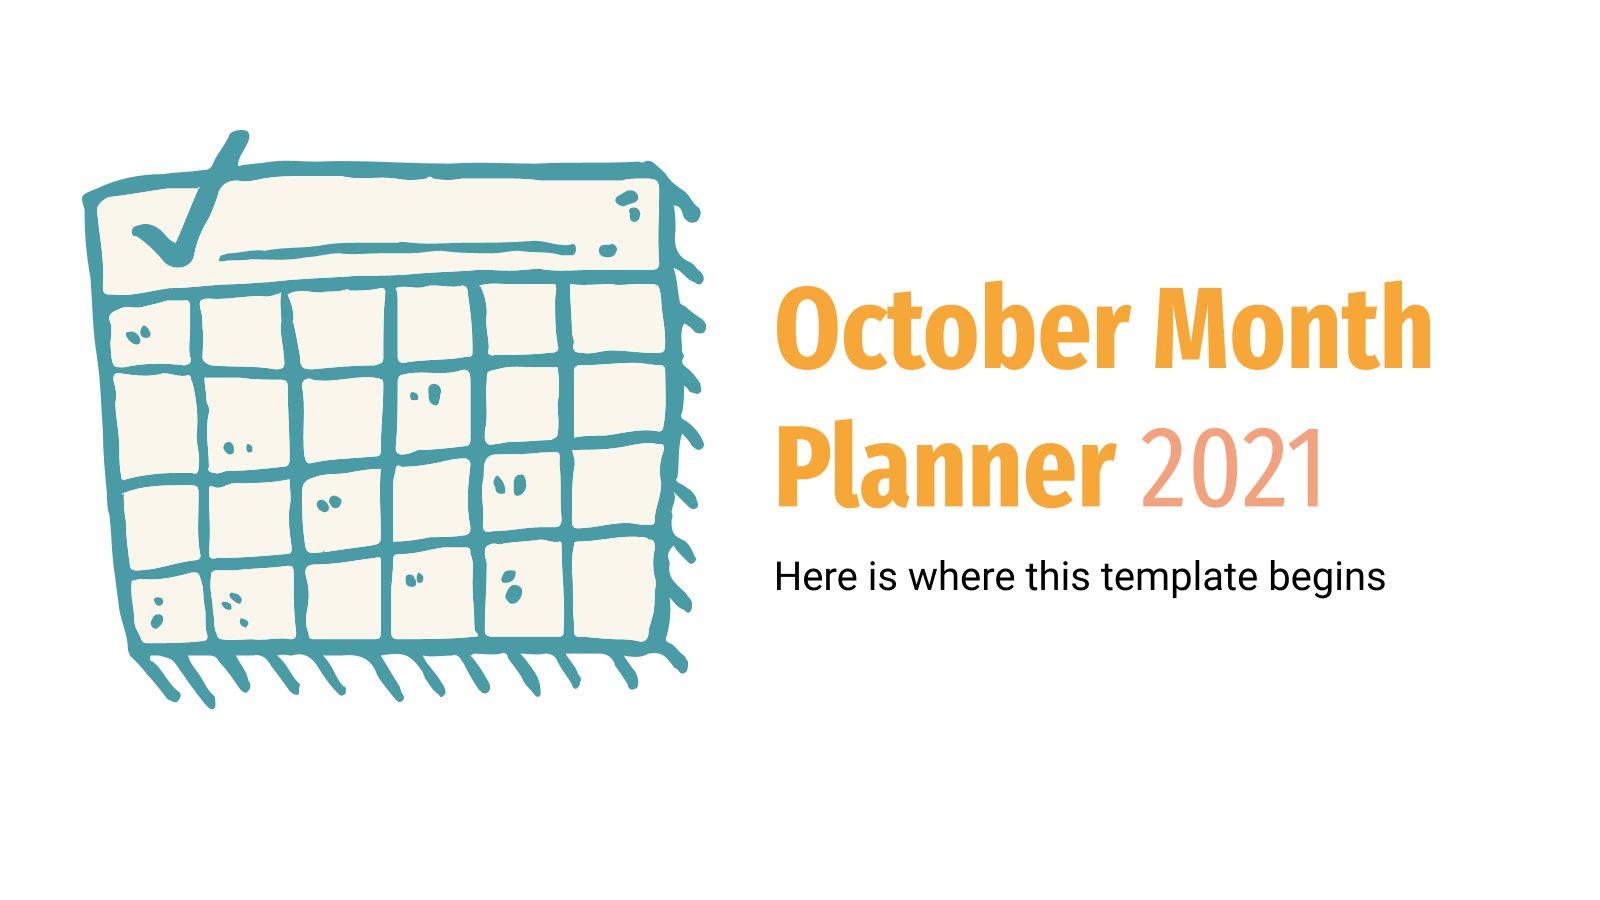 October Month Planner 2021 Infographics presentation template